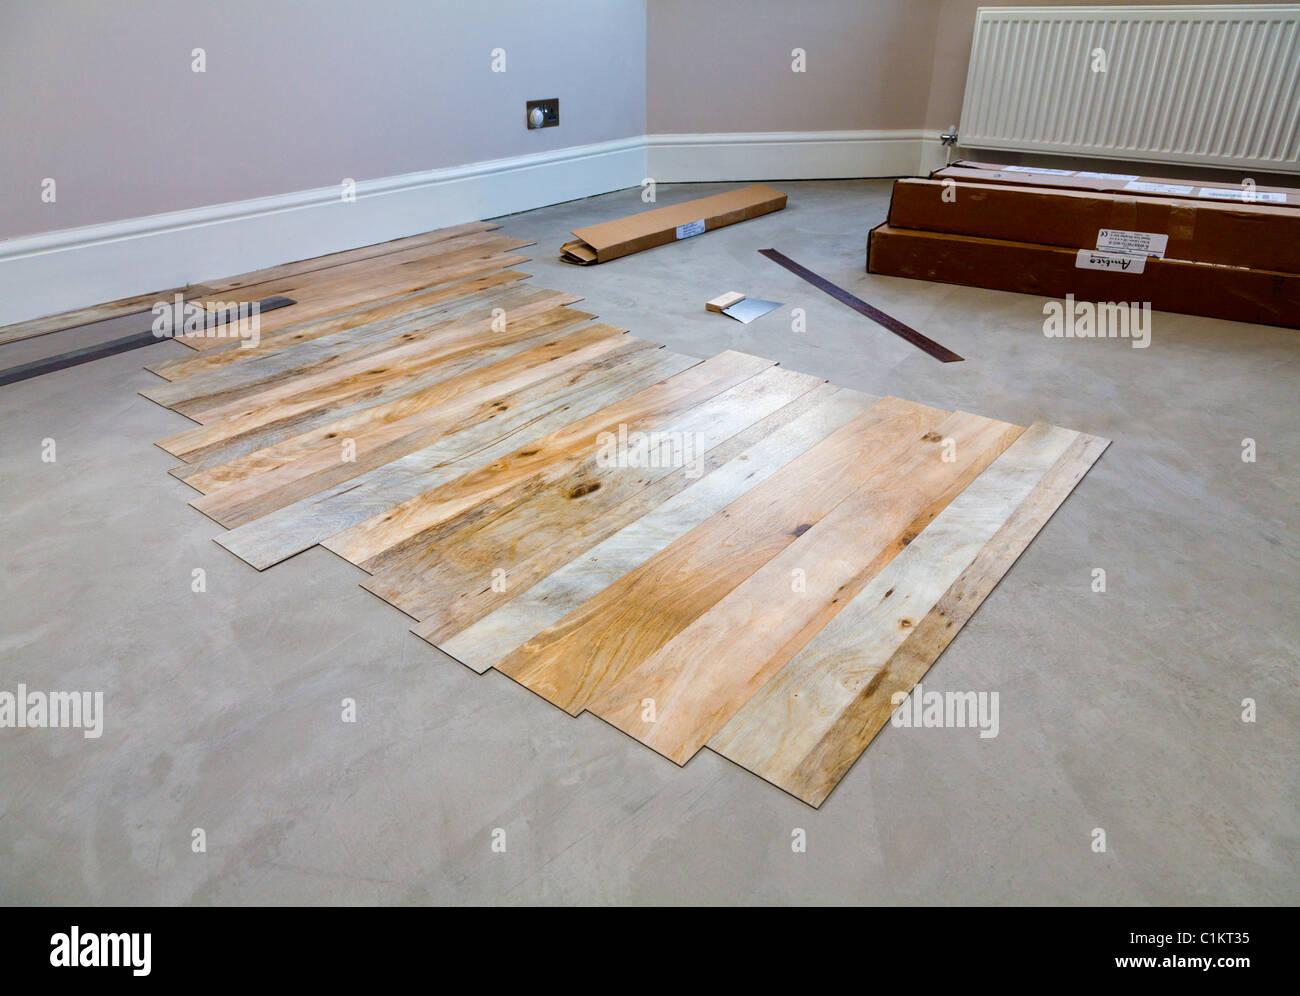 Fußbodenbelag Amtico ~ Verlegung von amtico bodenbelag stockfoto bild: 35471385 alamy